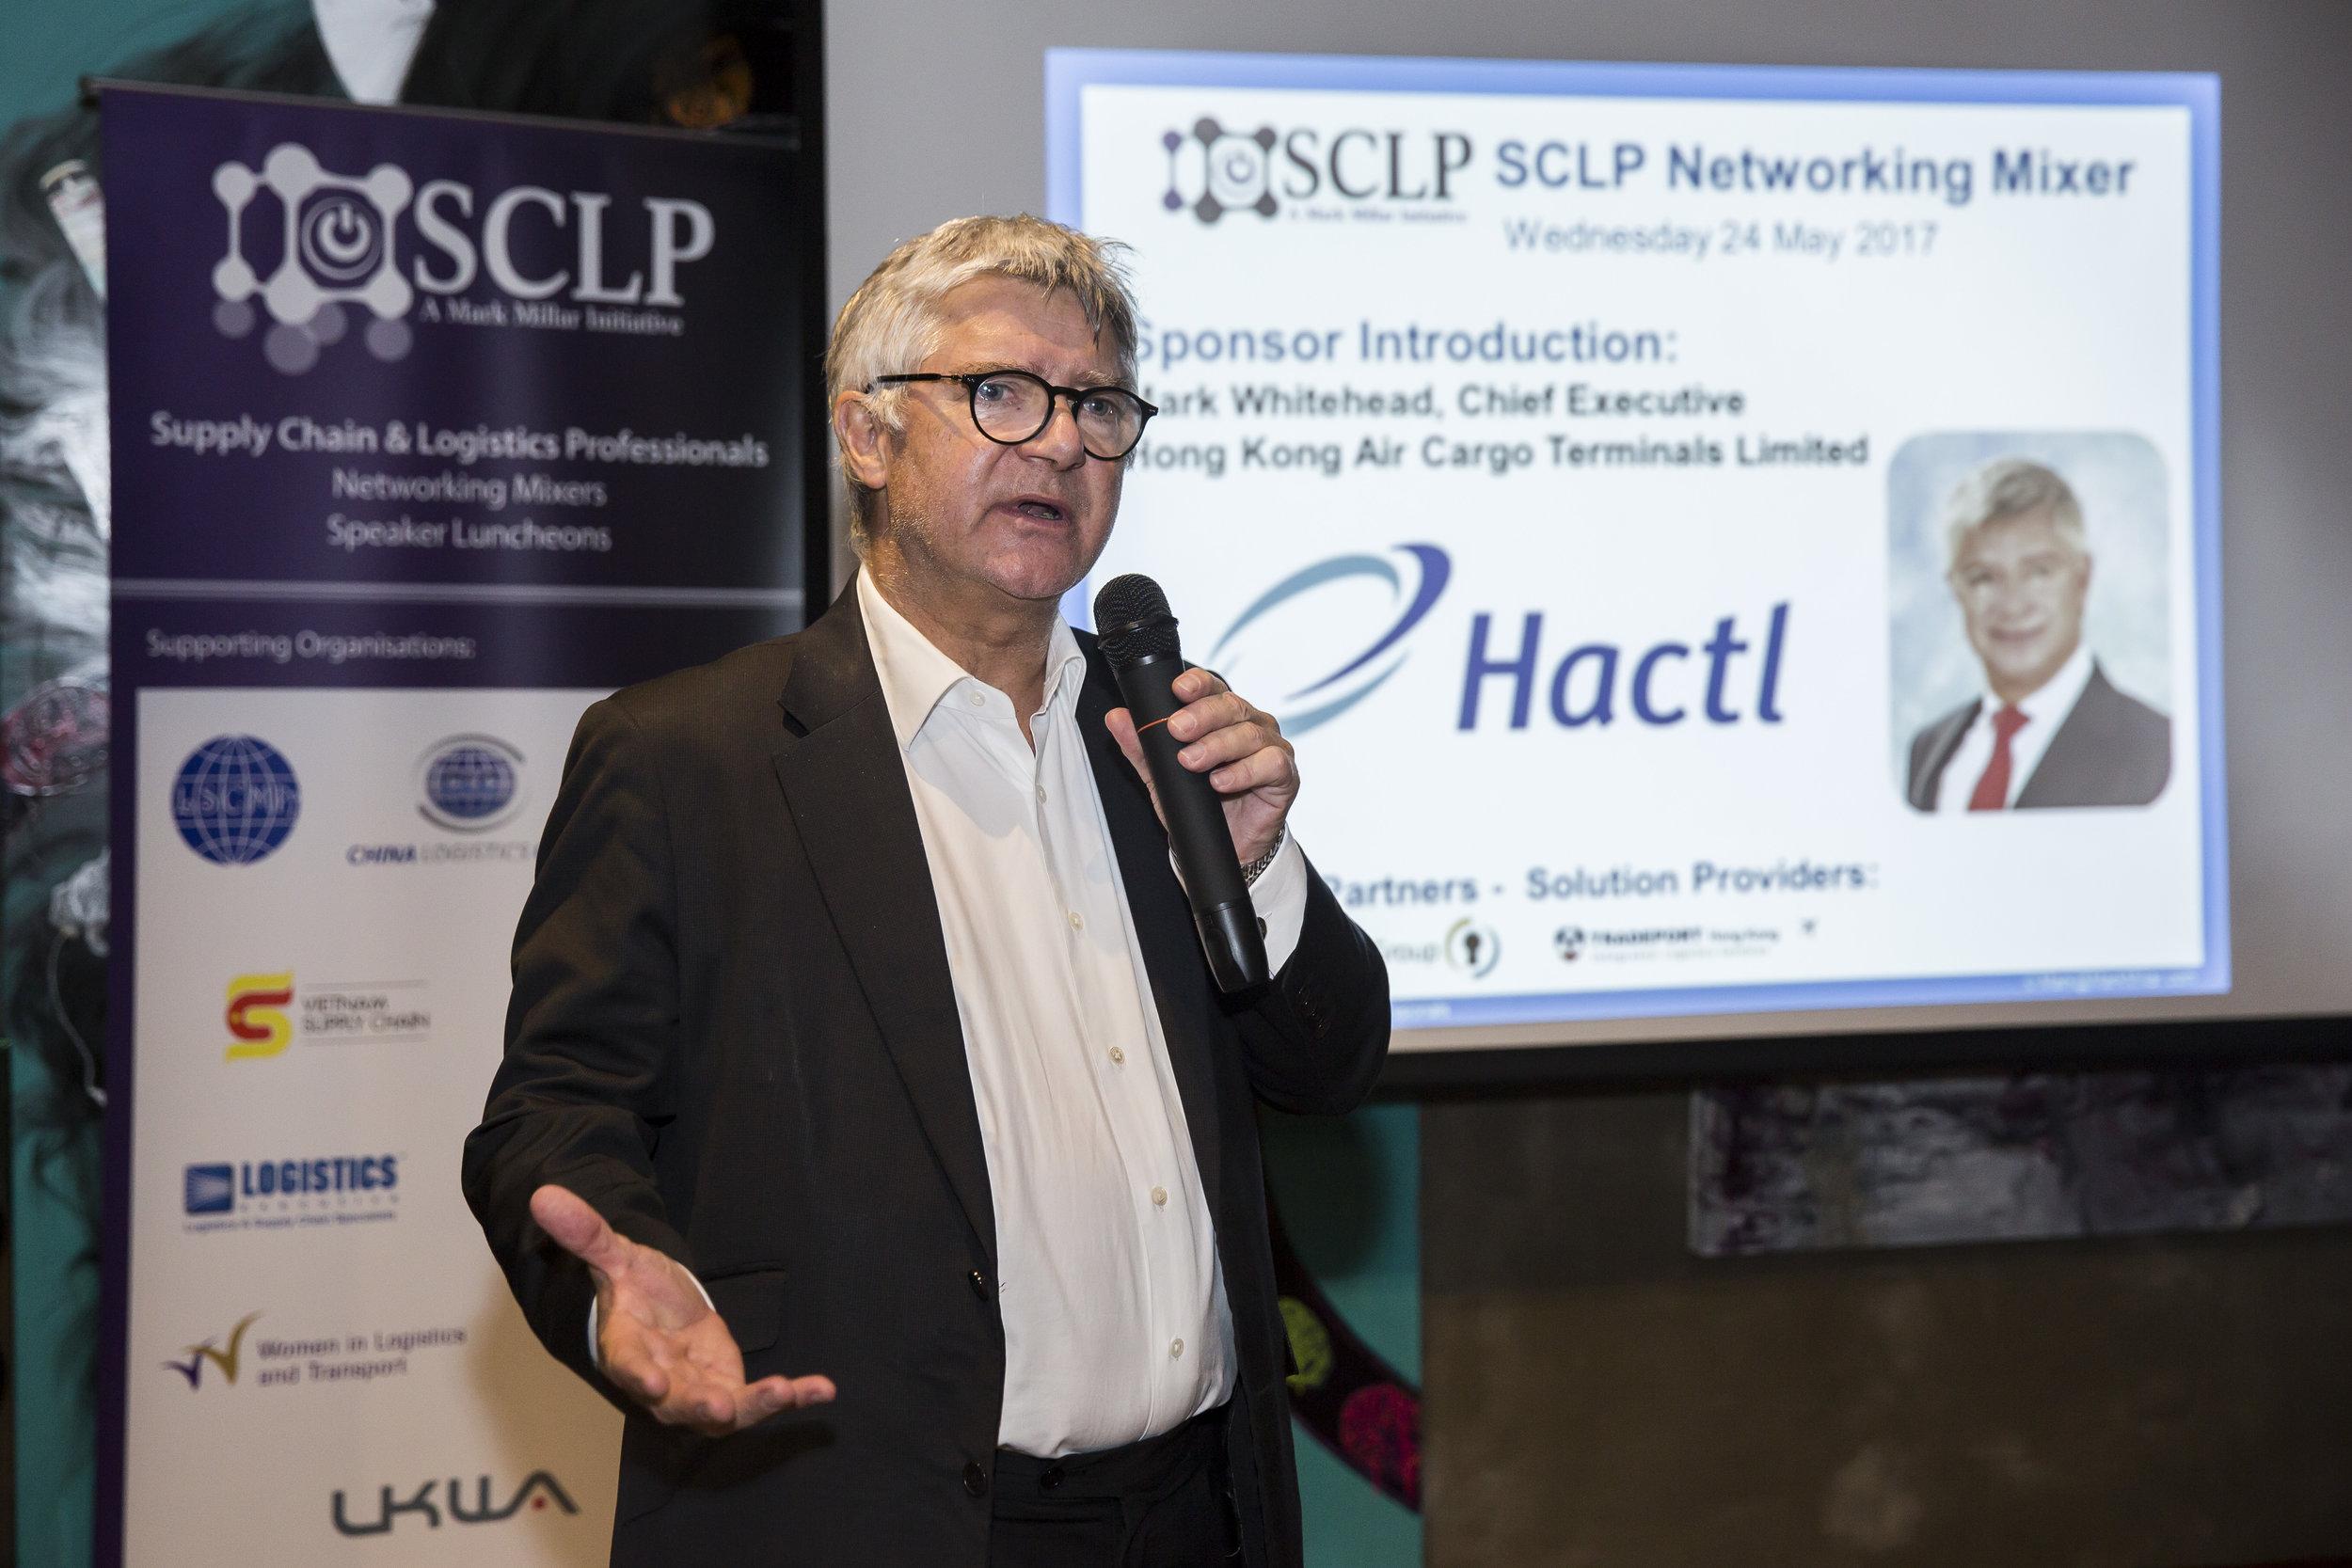 Mark Whitehead, Chief Executive, Hactl